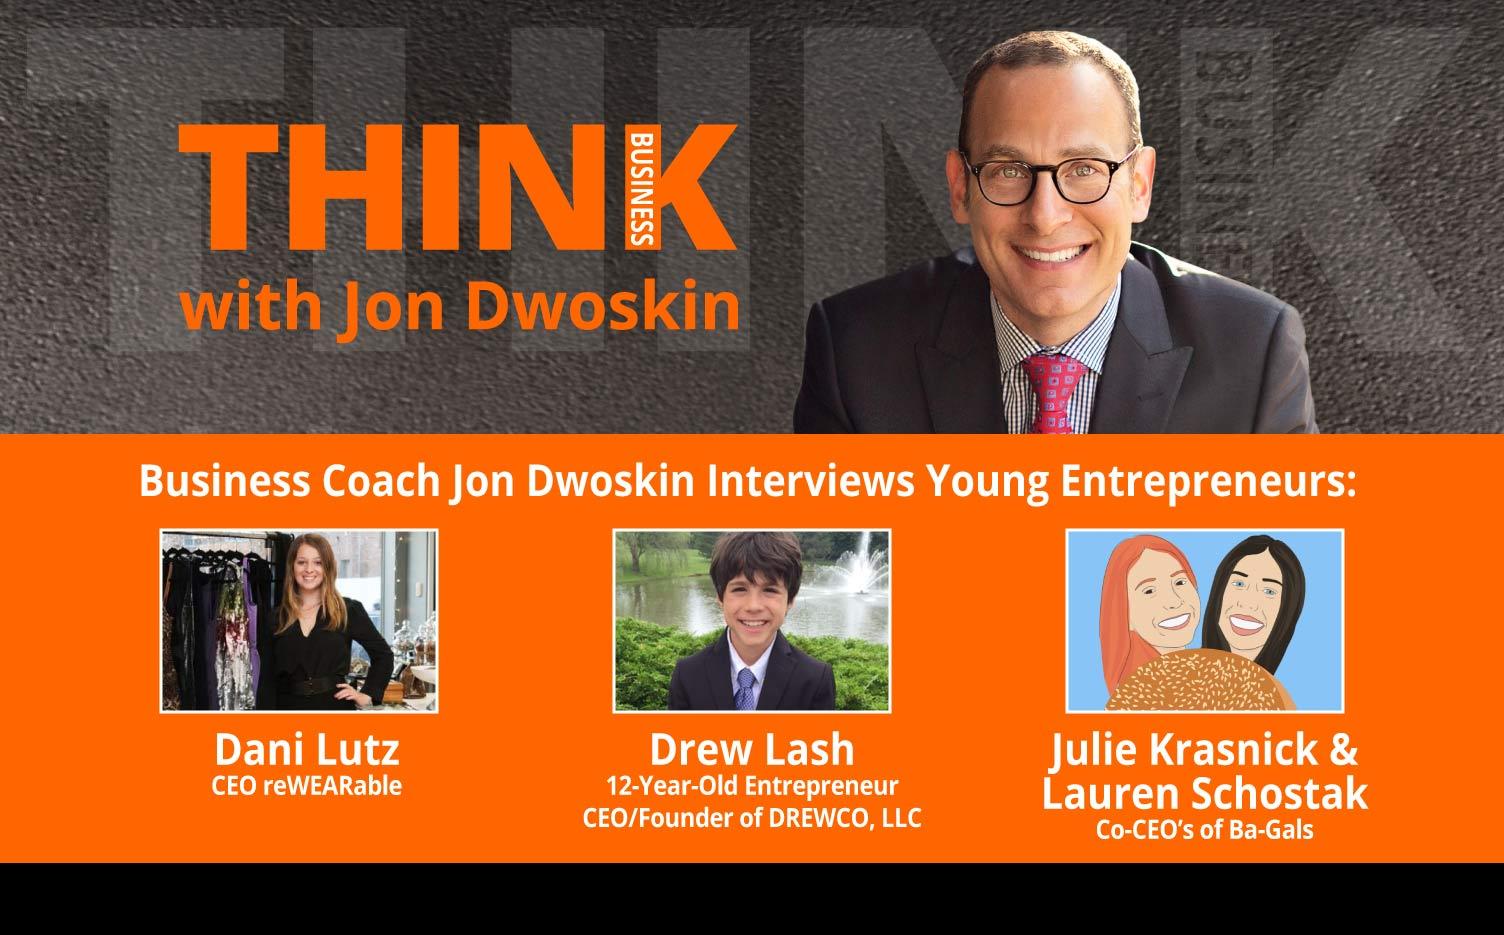 THINK Business Podcast: Jon Dwoskin Interviews Young Entrepreneurs: Dani Lutz, Drew Lash, Julie Krasnick and Lauren Schostak